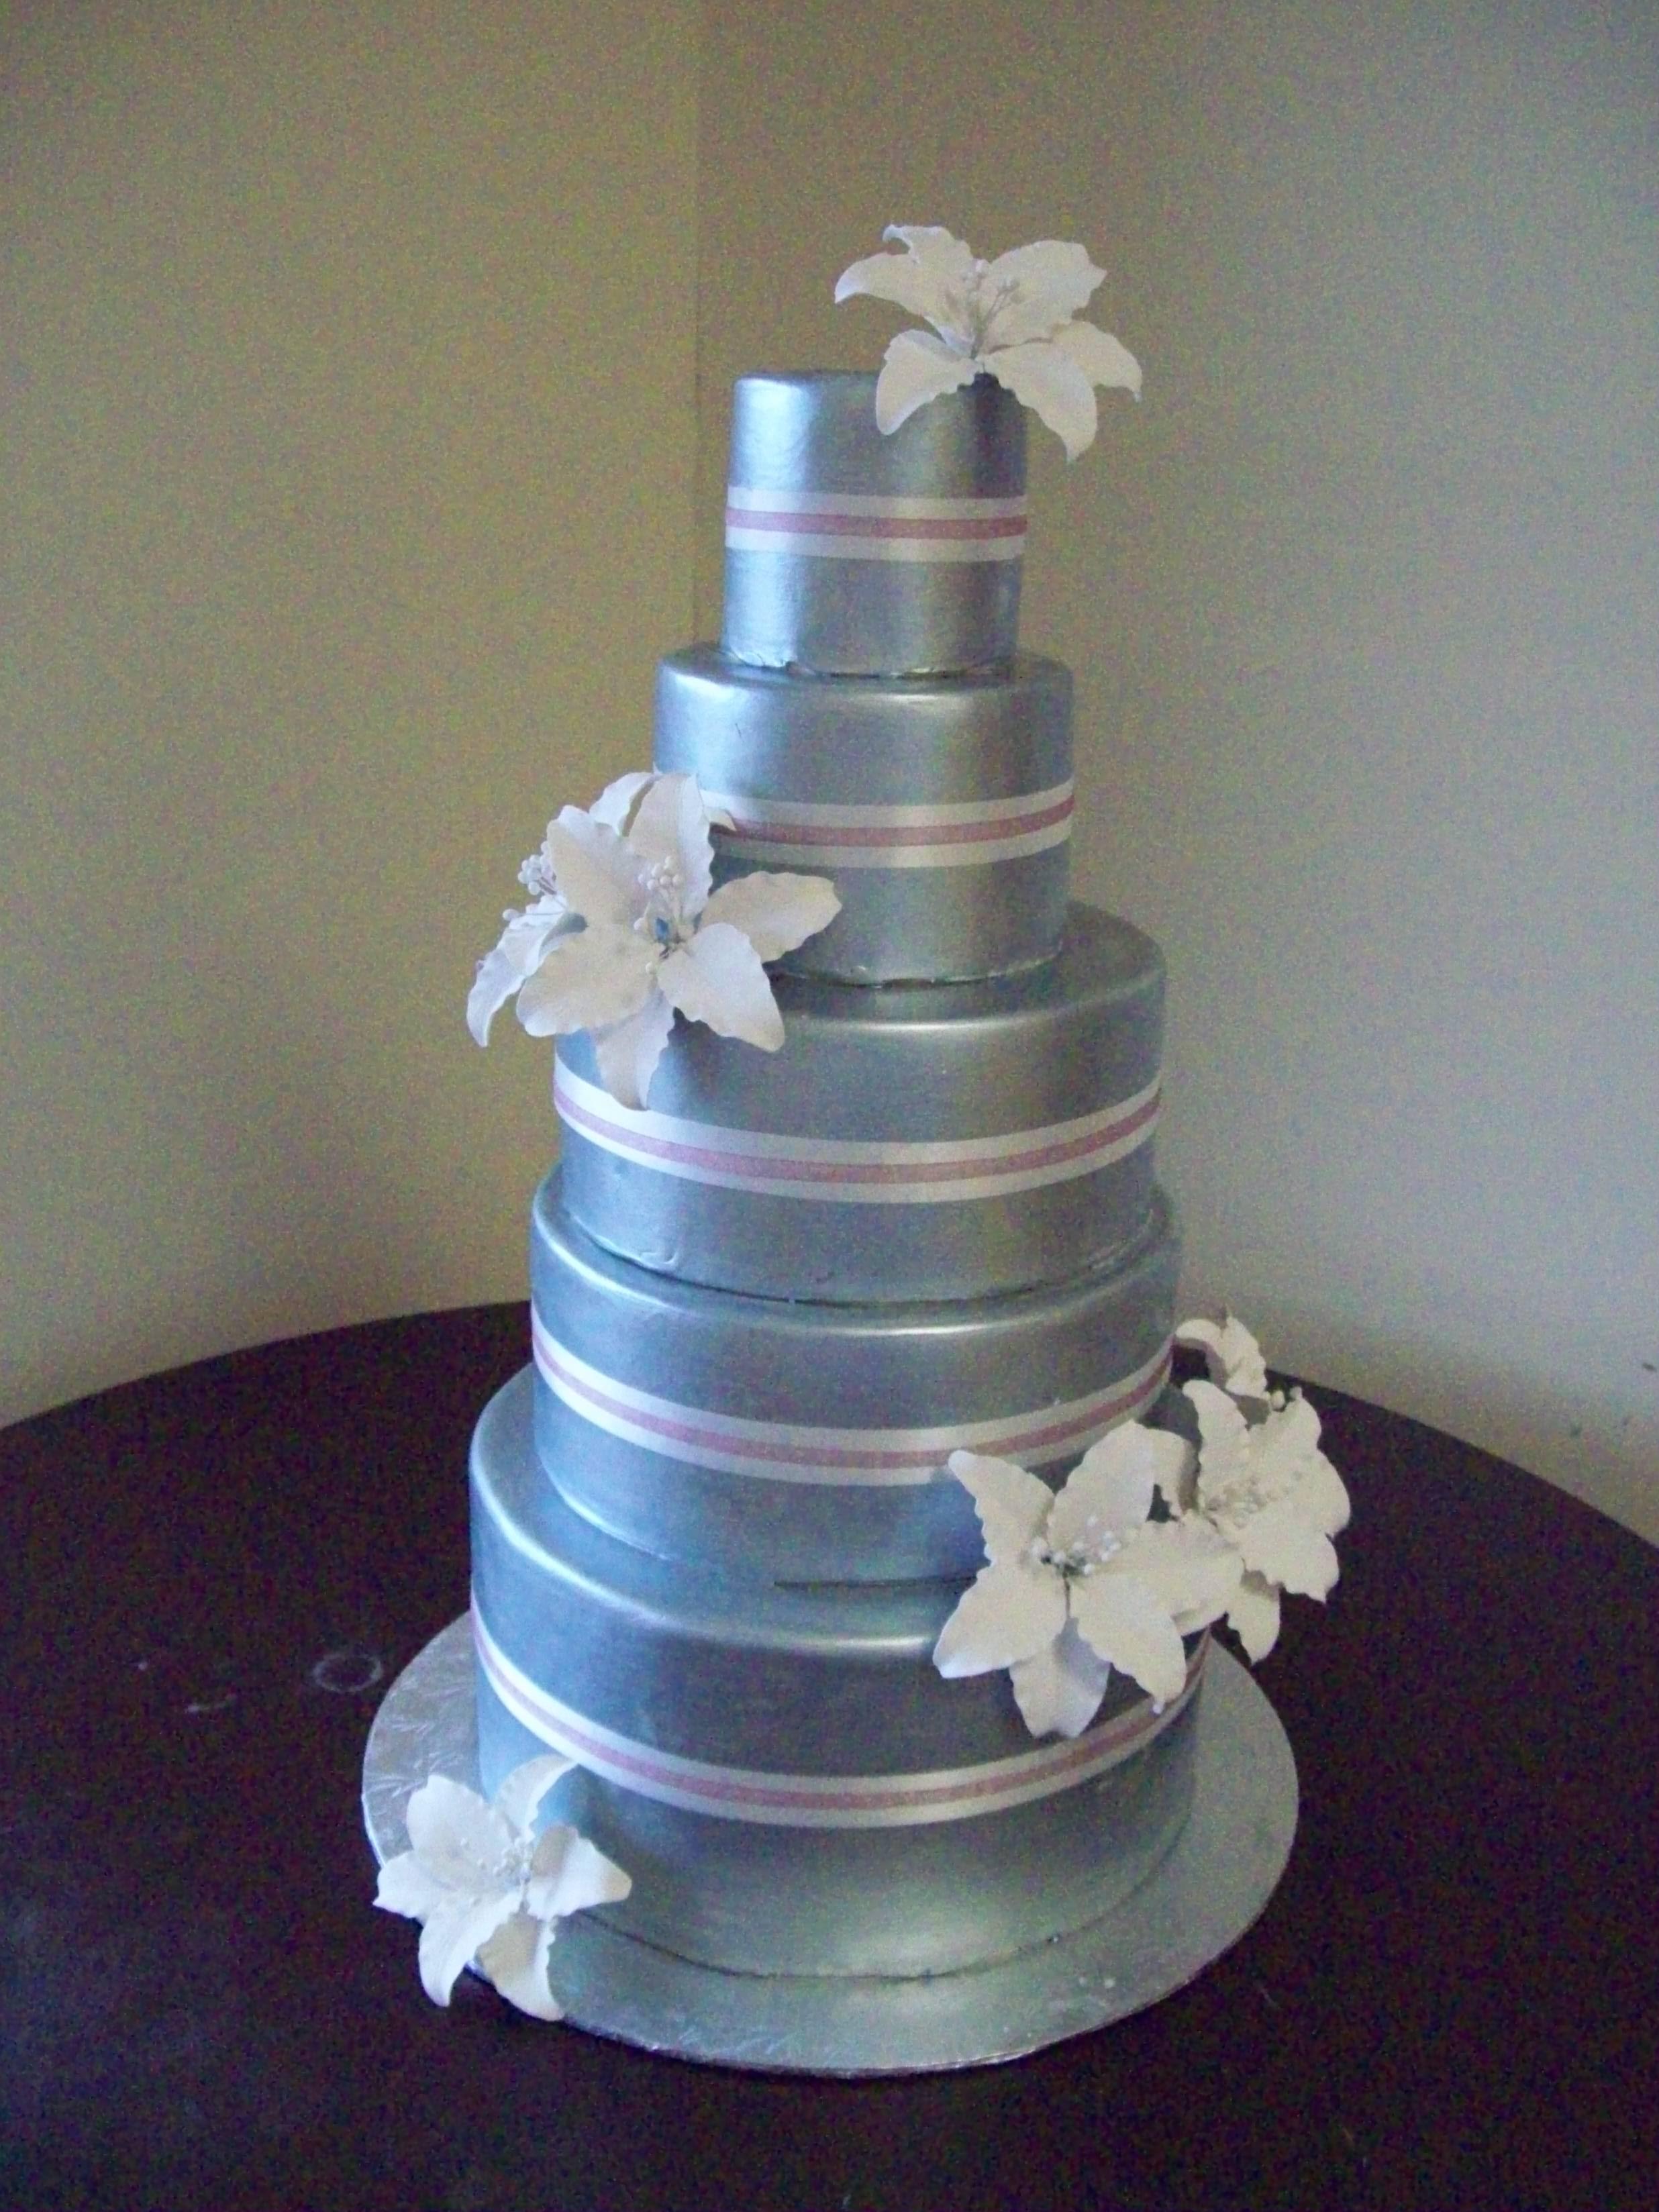 http://fc00.deviantart.net/fs50/f/2009/263/f/0/Silver_wedding_cake_by_see_through_silence.jpg